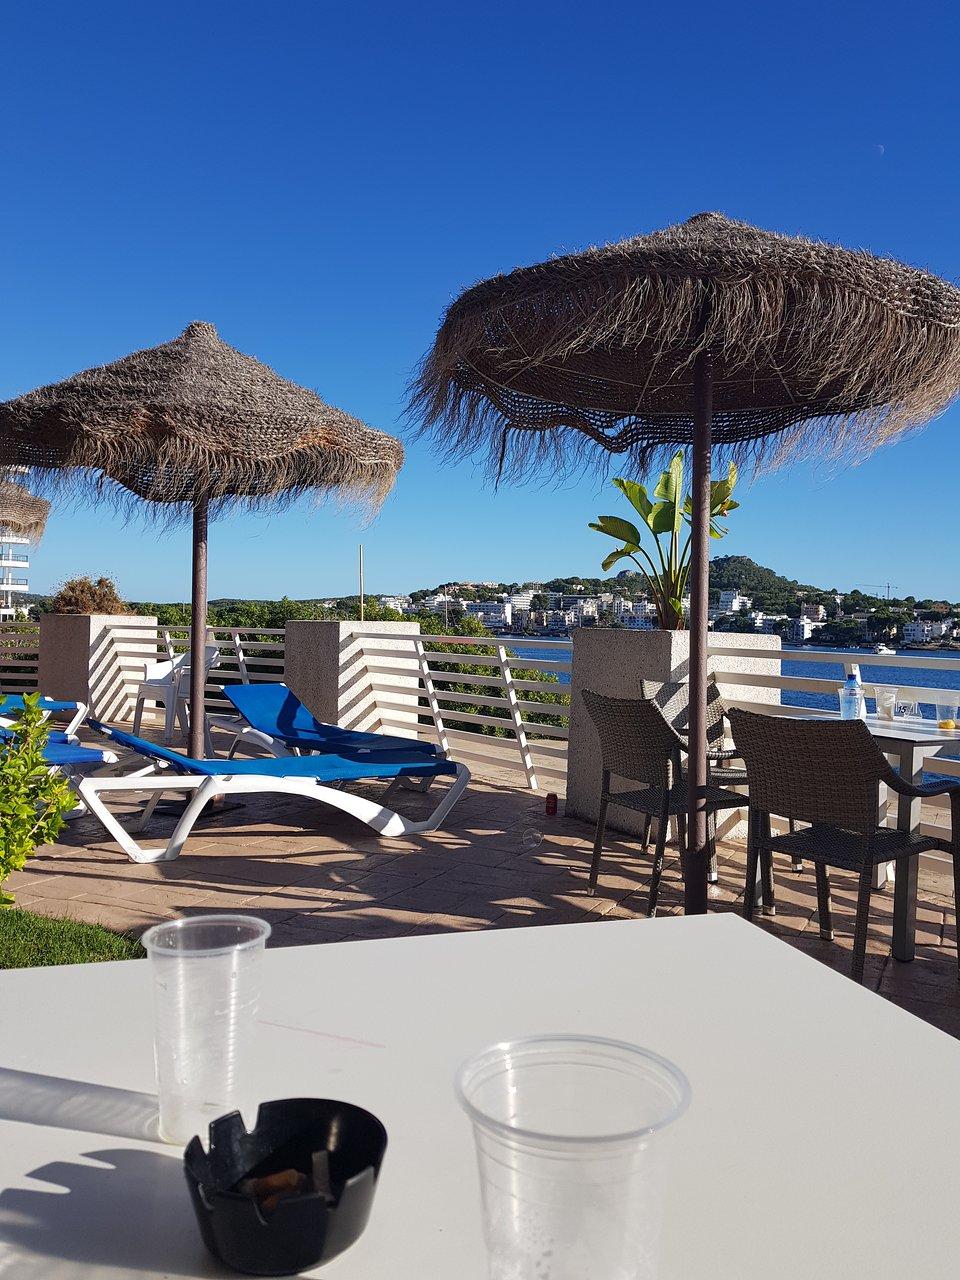 Hotel Review g d Reviews or10 TRH Jardin del Mar Santa Ponsa Calvia Majorca Balearic Islands